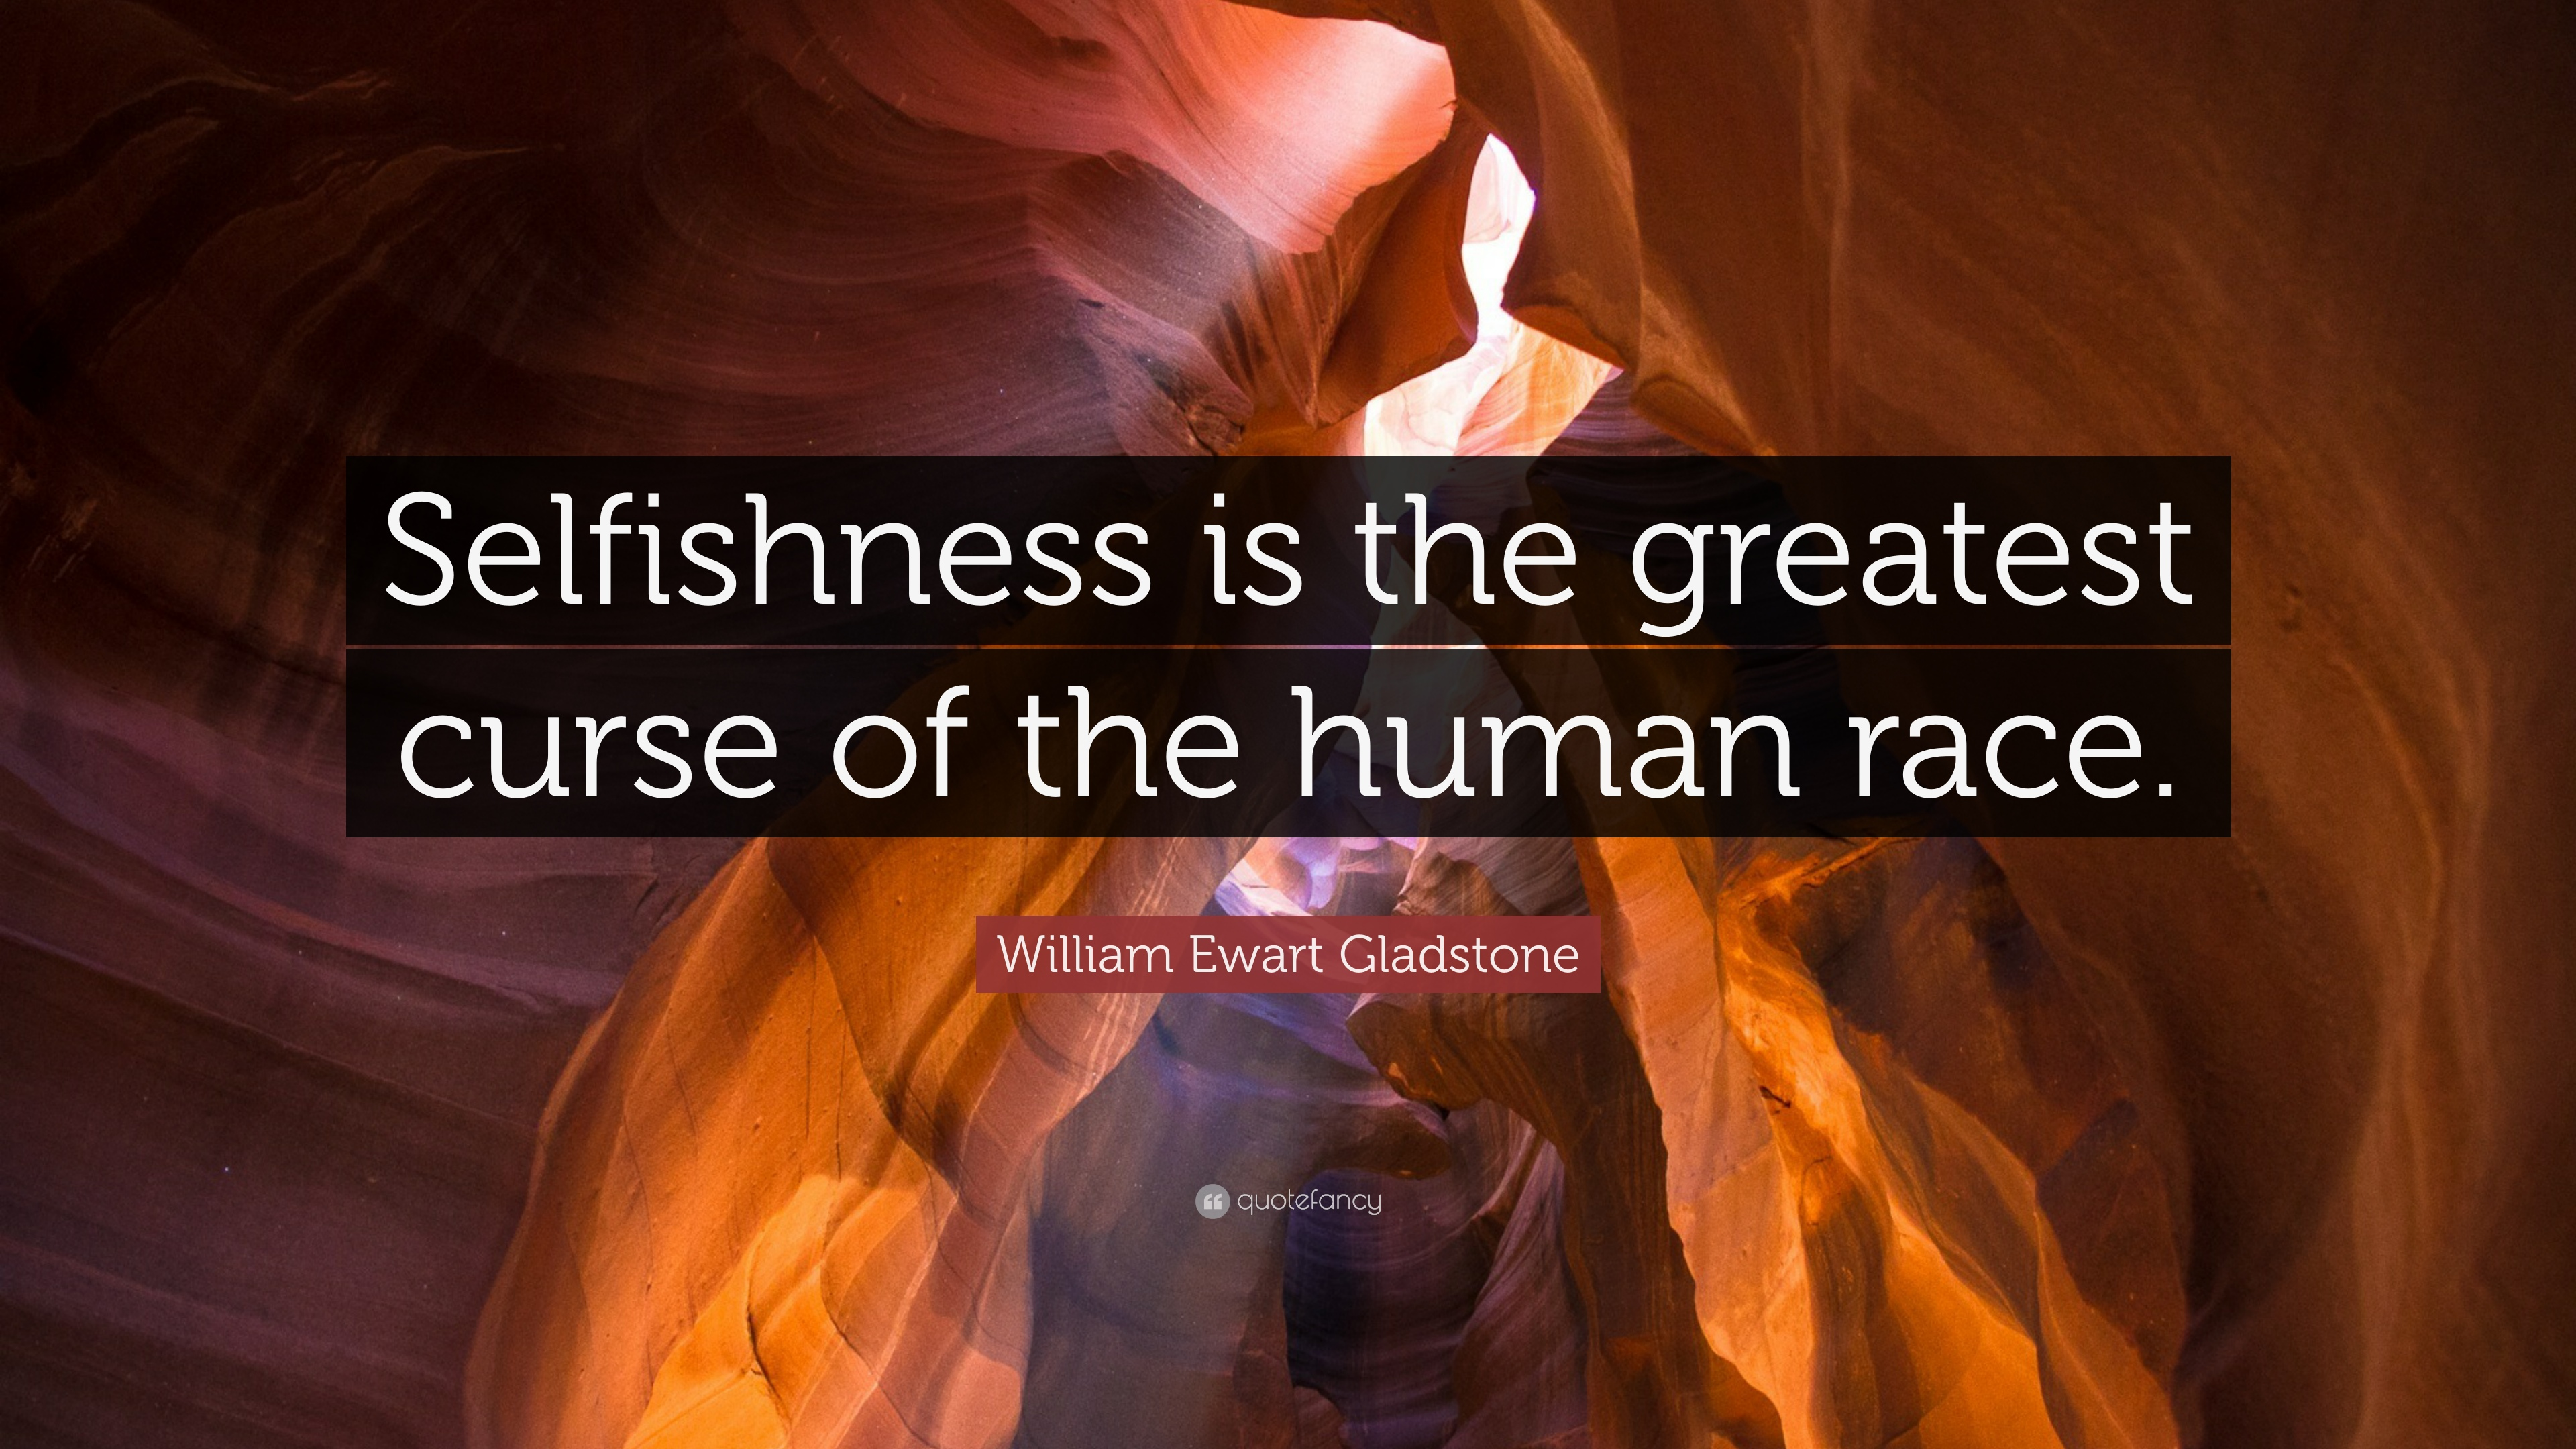 William ewart gladstone quote selfishness is the greatest curse william ewart gladstone quote selfishness is the greatest curse of the human race sciox Choice Image